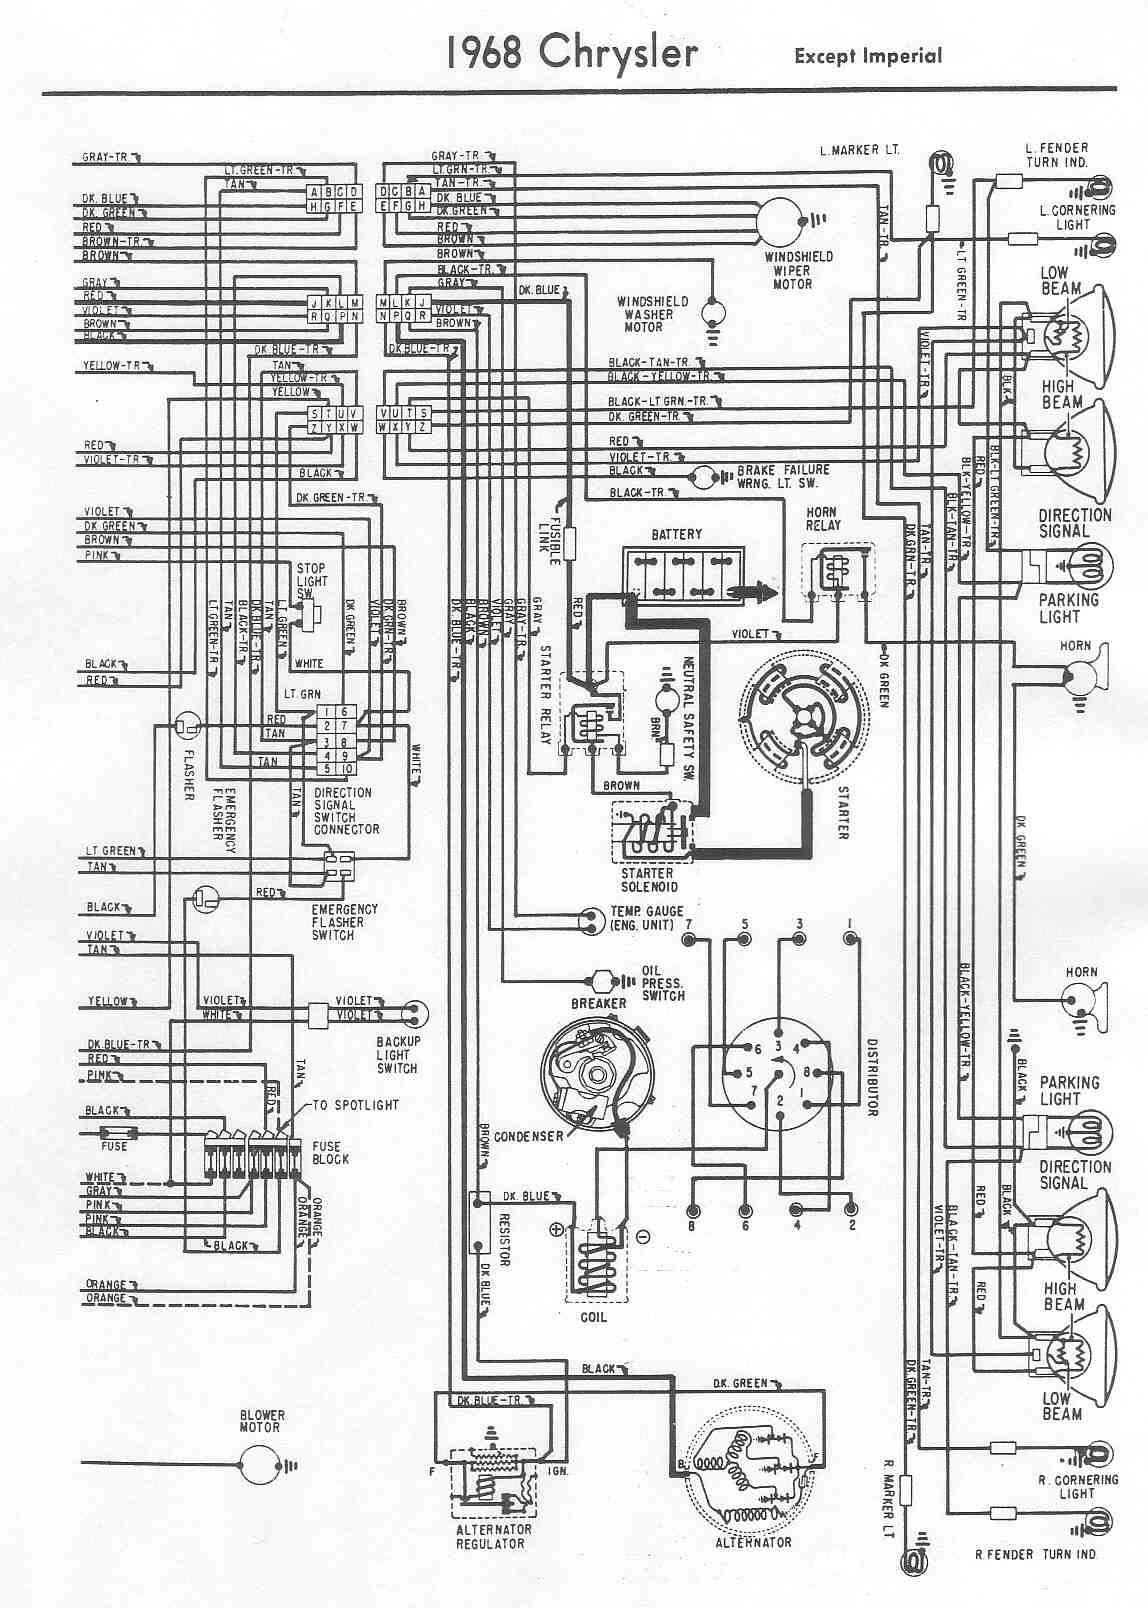 1968 Cadillac Deville Headlight Wiring Diagram Data 2001 Impala Schematics